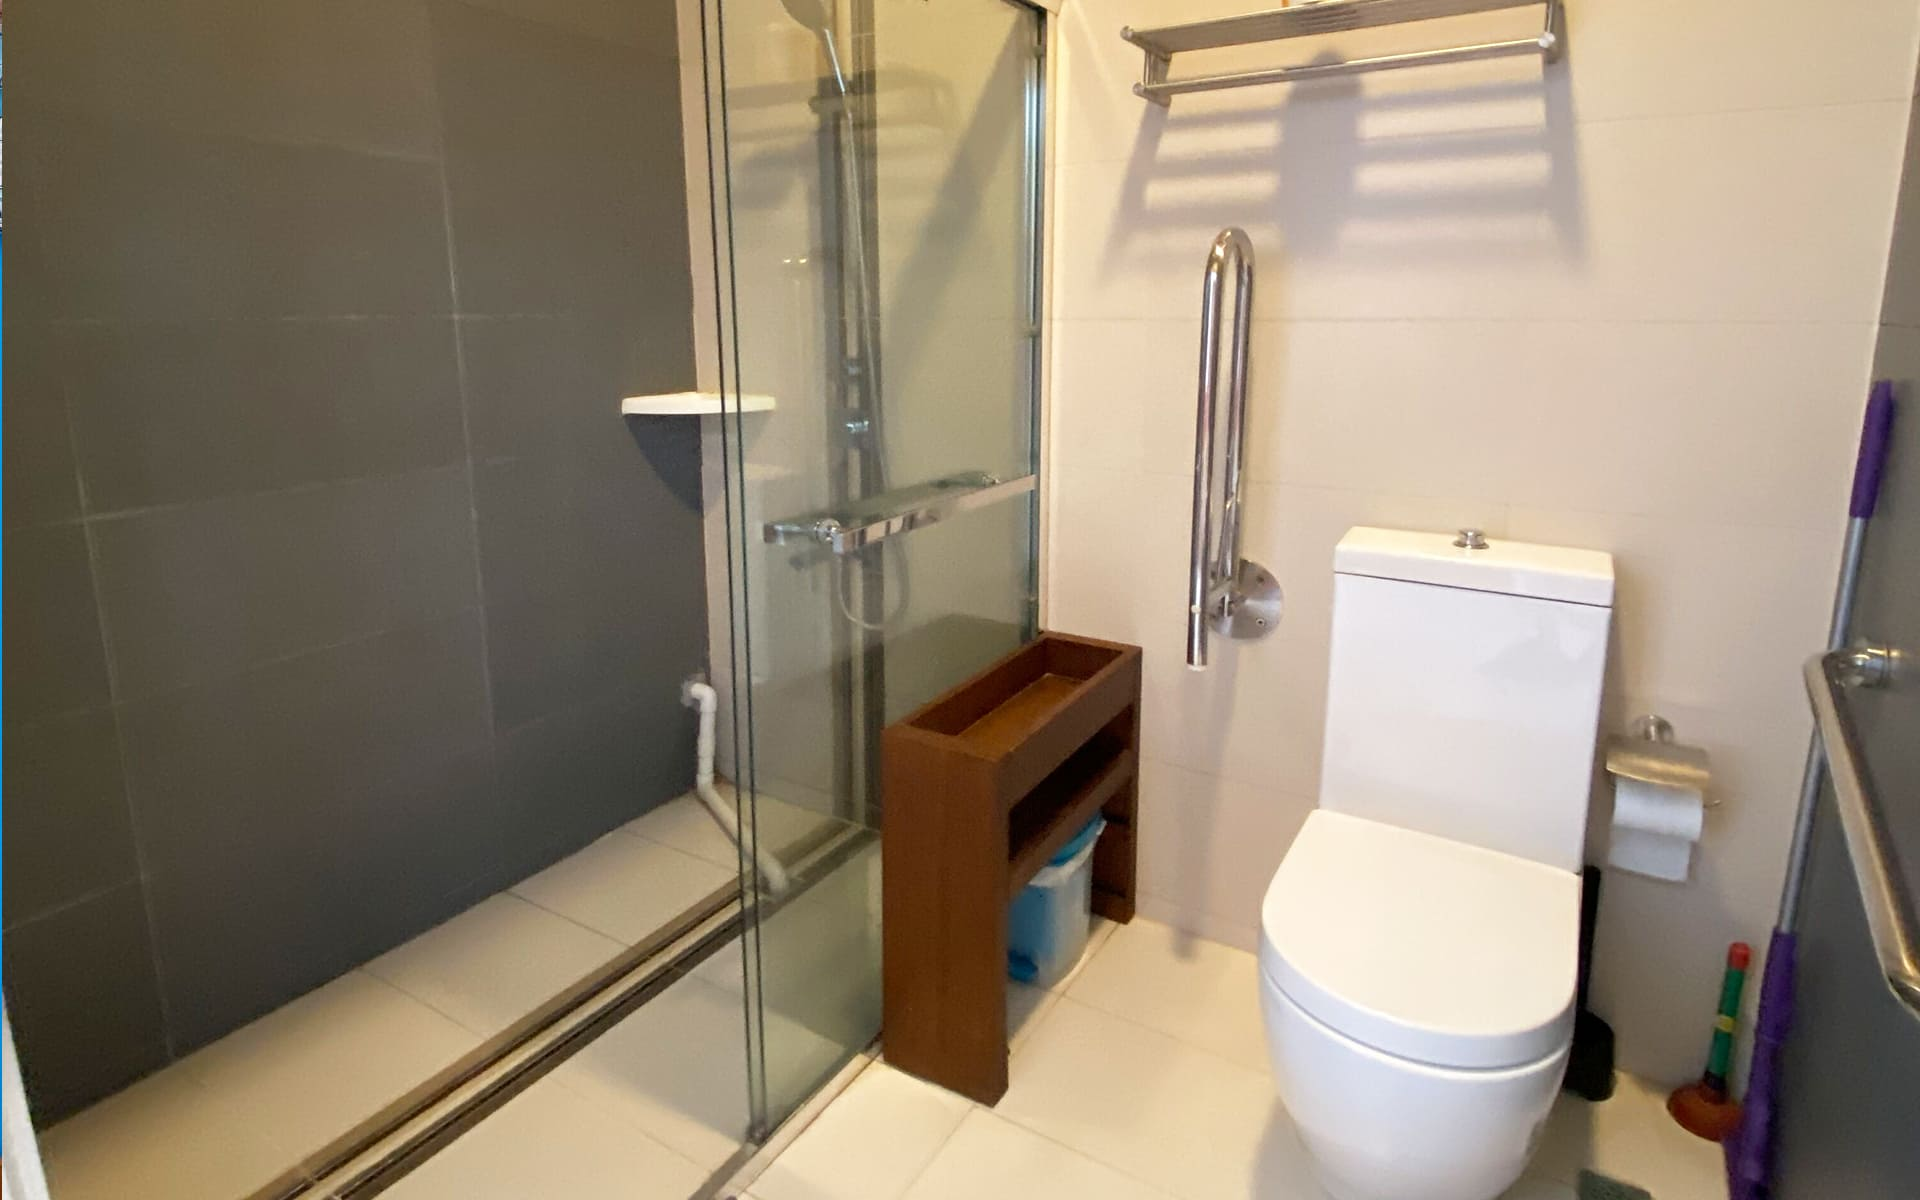 hk_service_apartment_7305086701589447075.jpg